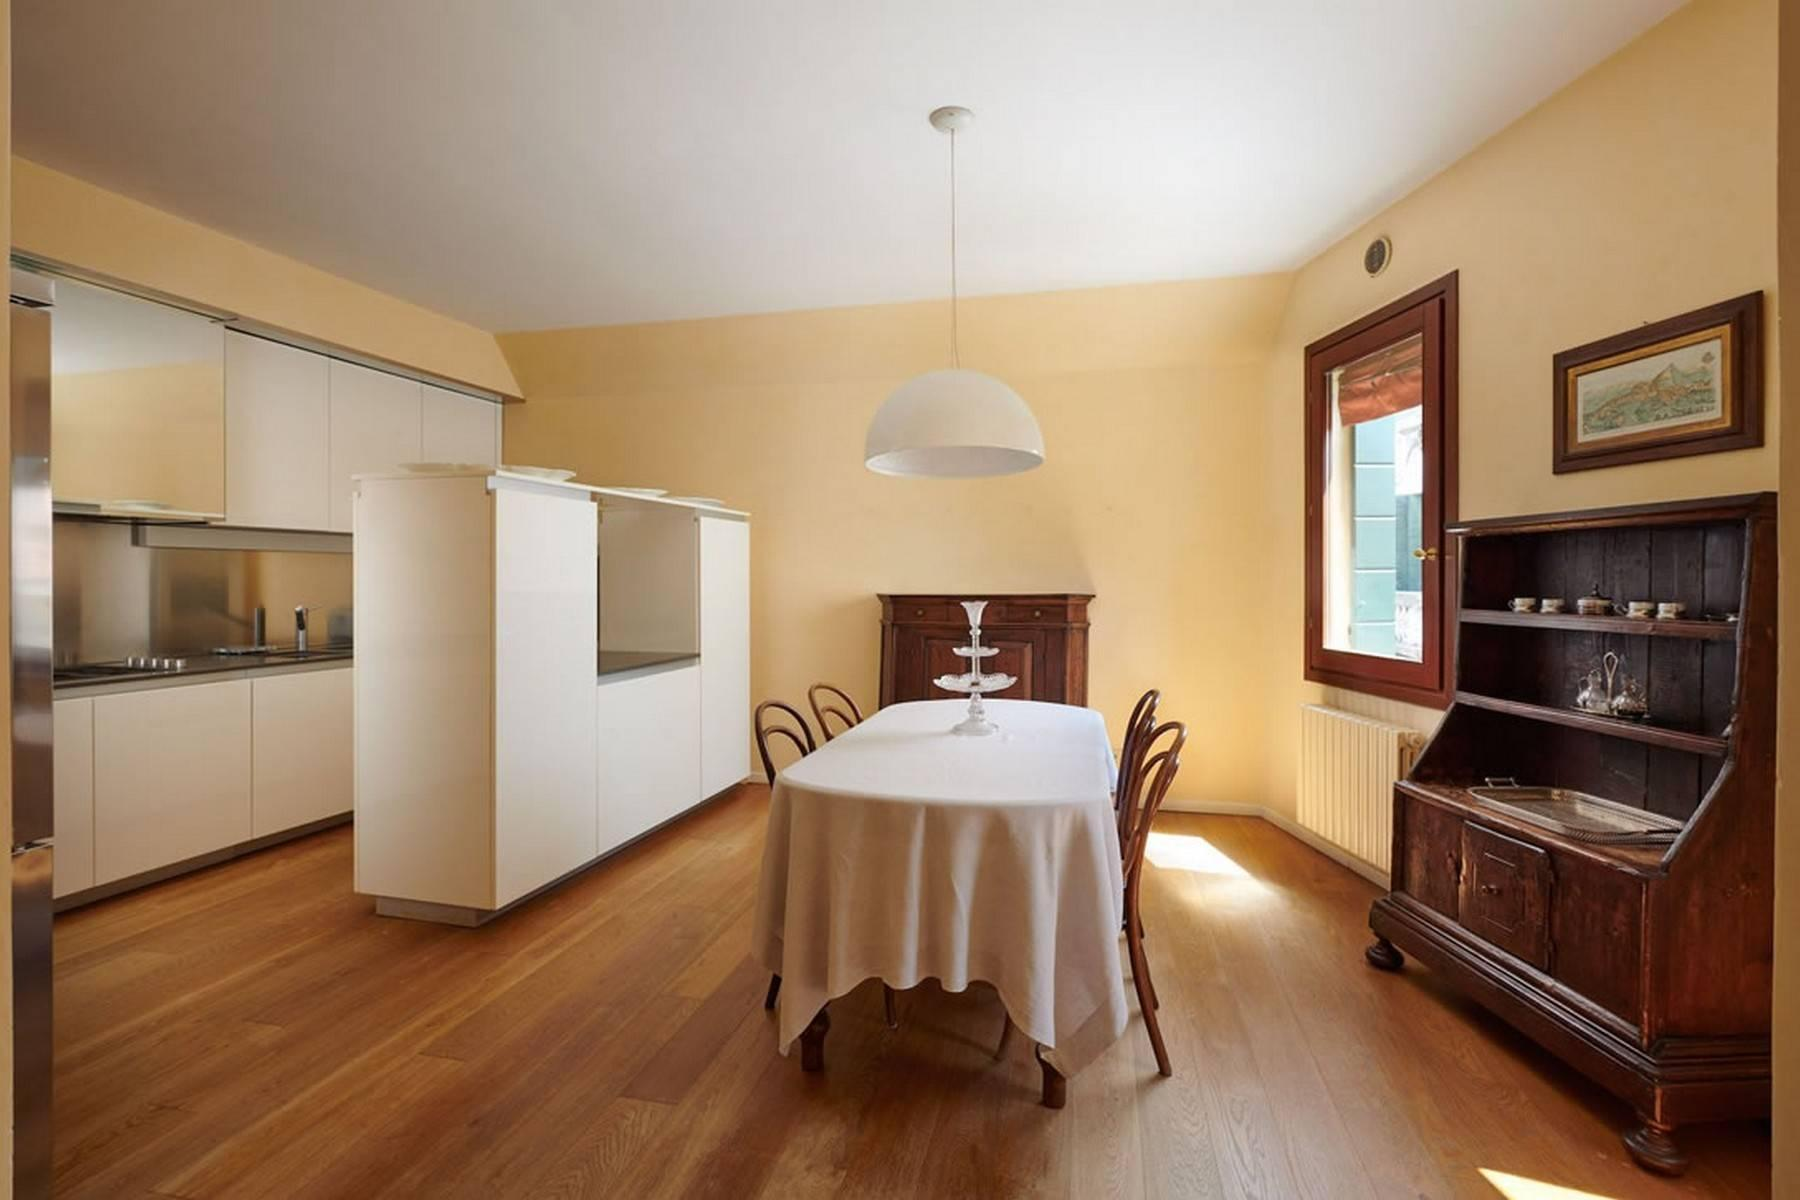 Appartement de design dans le Palazzo Querini Stampalia / S.M. Formosa - 14